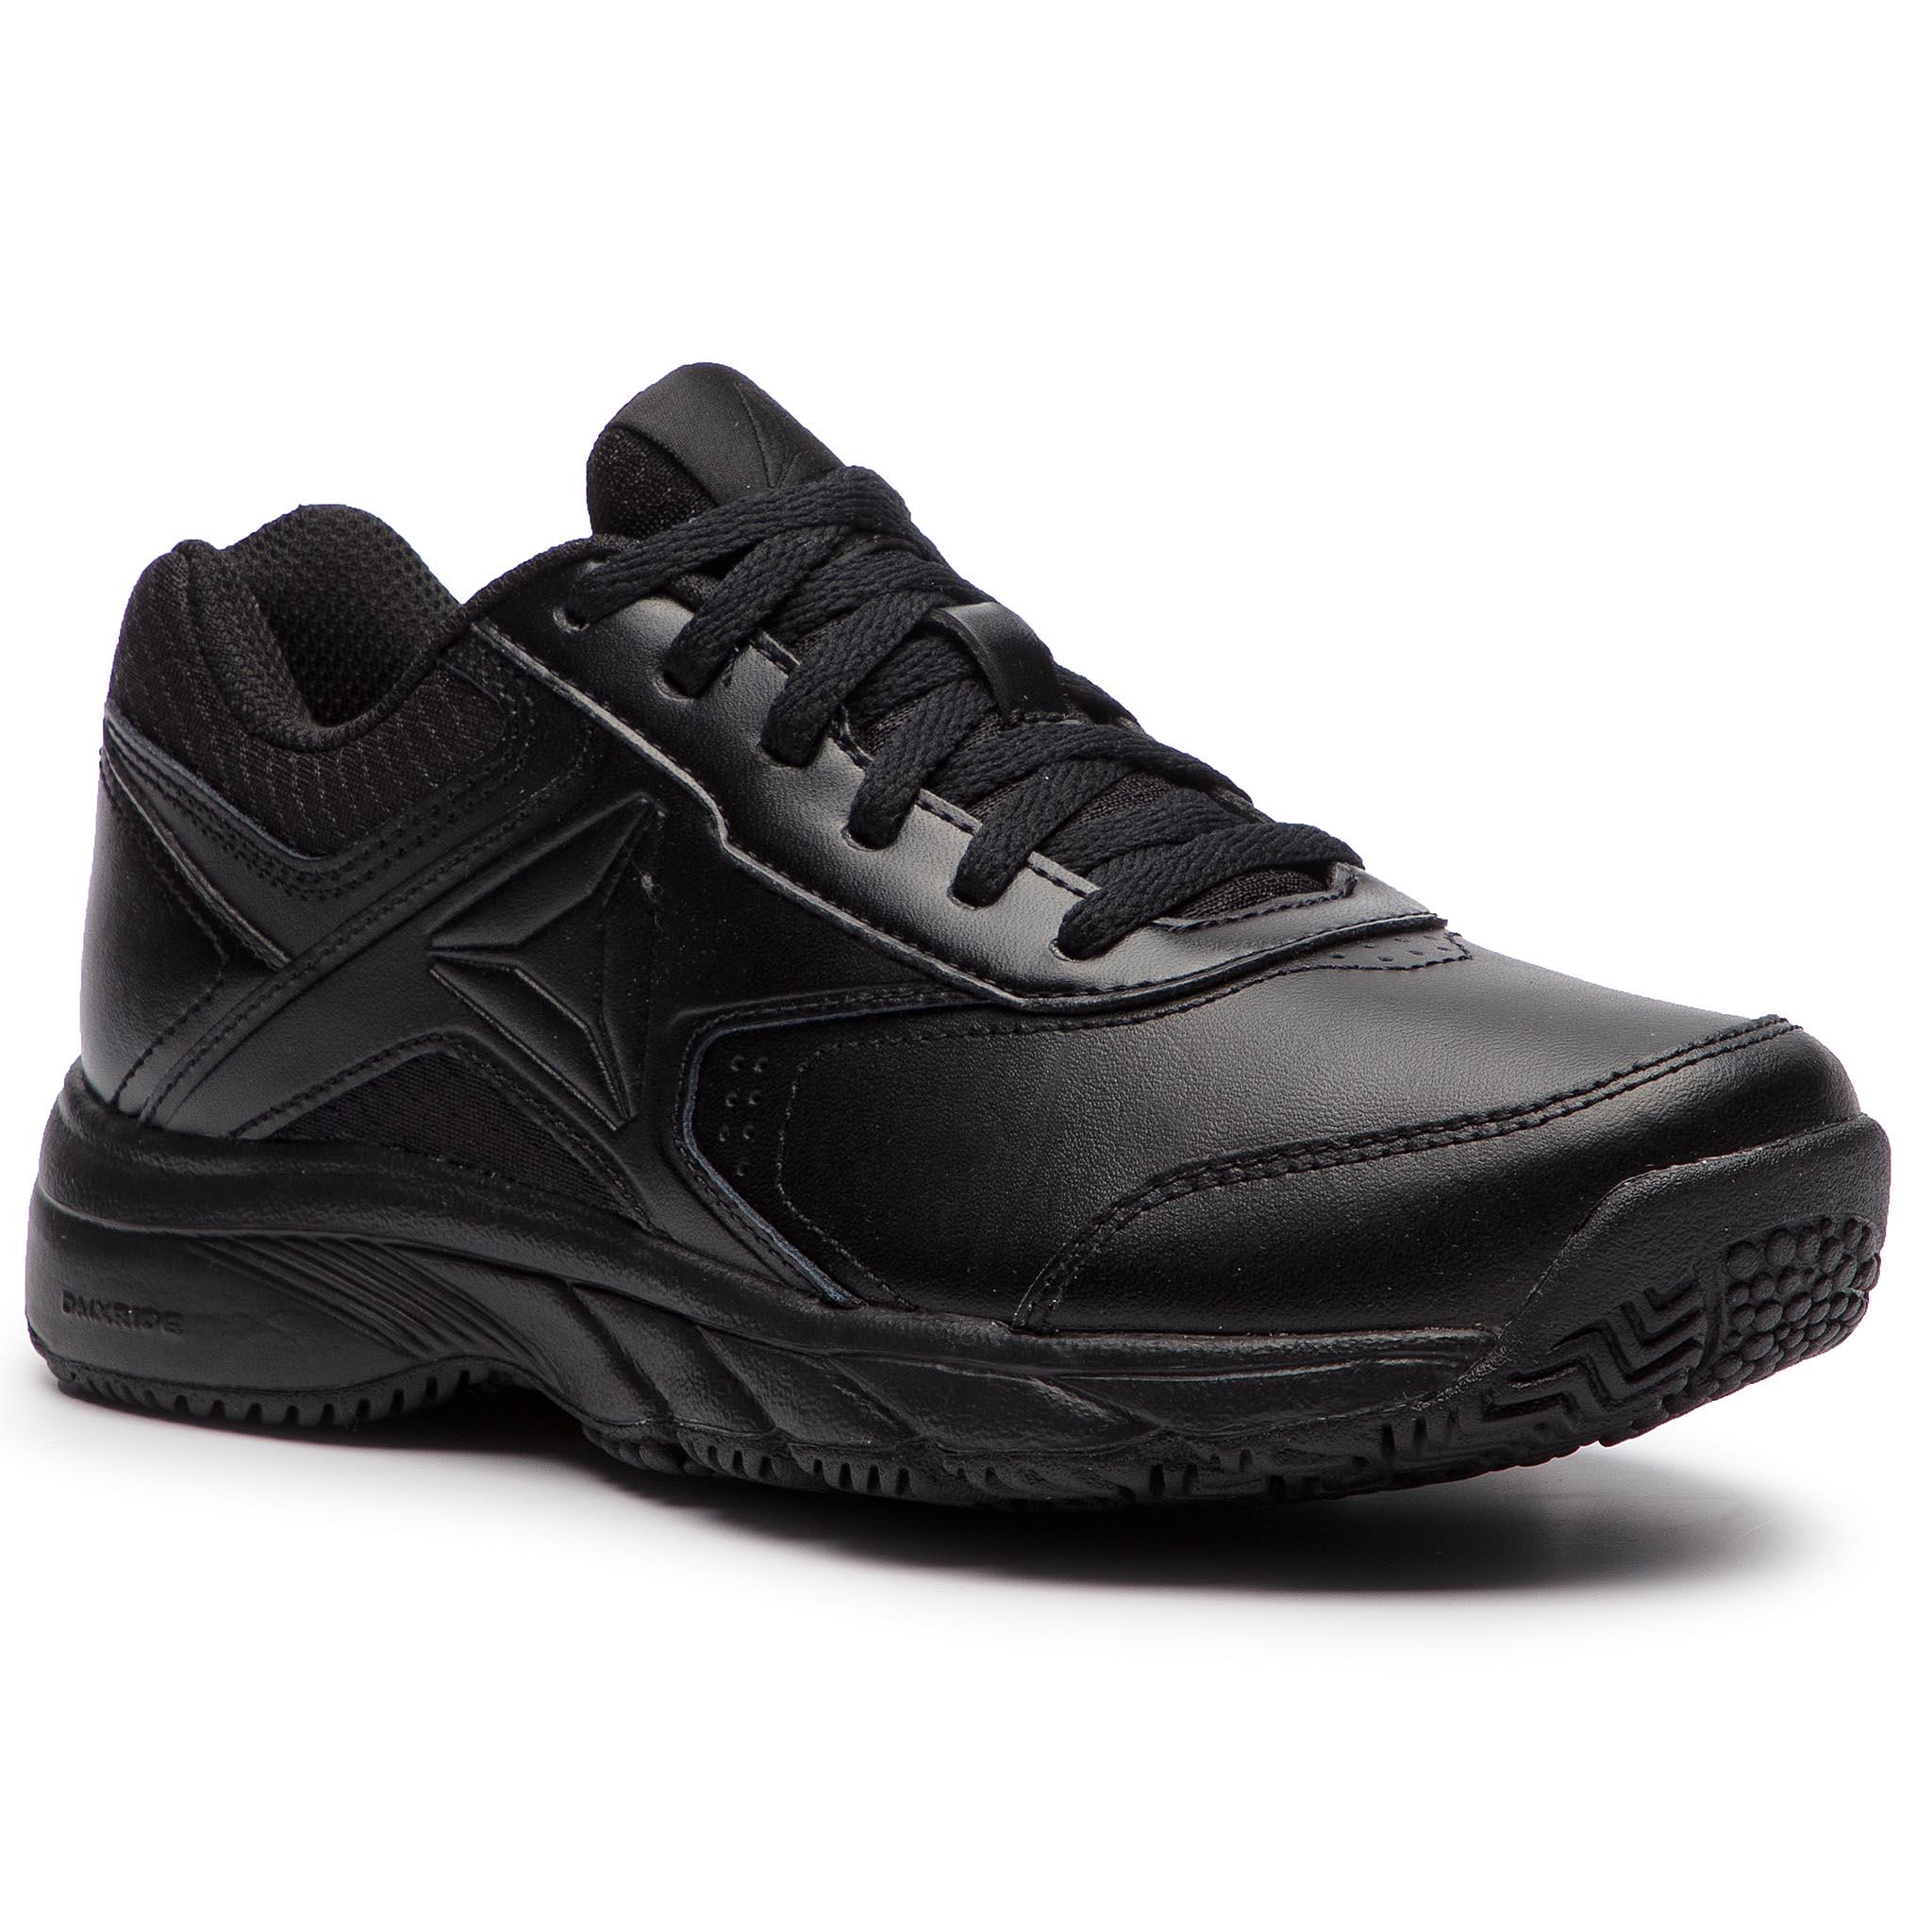 a3dda8ab1088 Shoes adidas - Terrex Ax2r Beta Cw S80741 Cblack Cblack Visgre ...